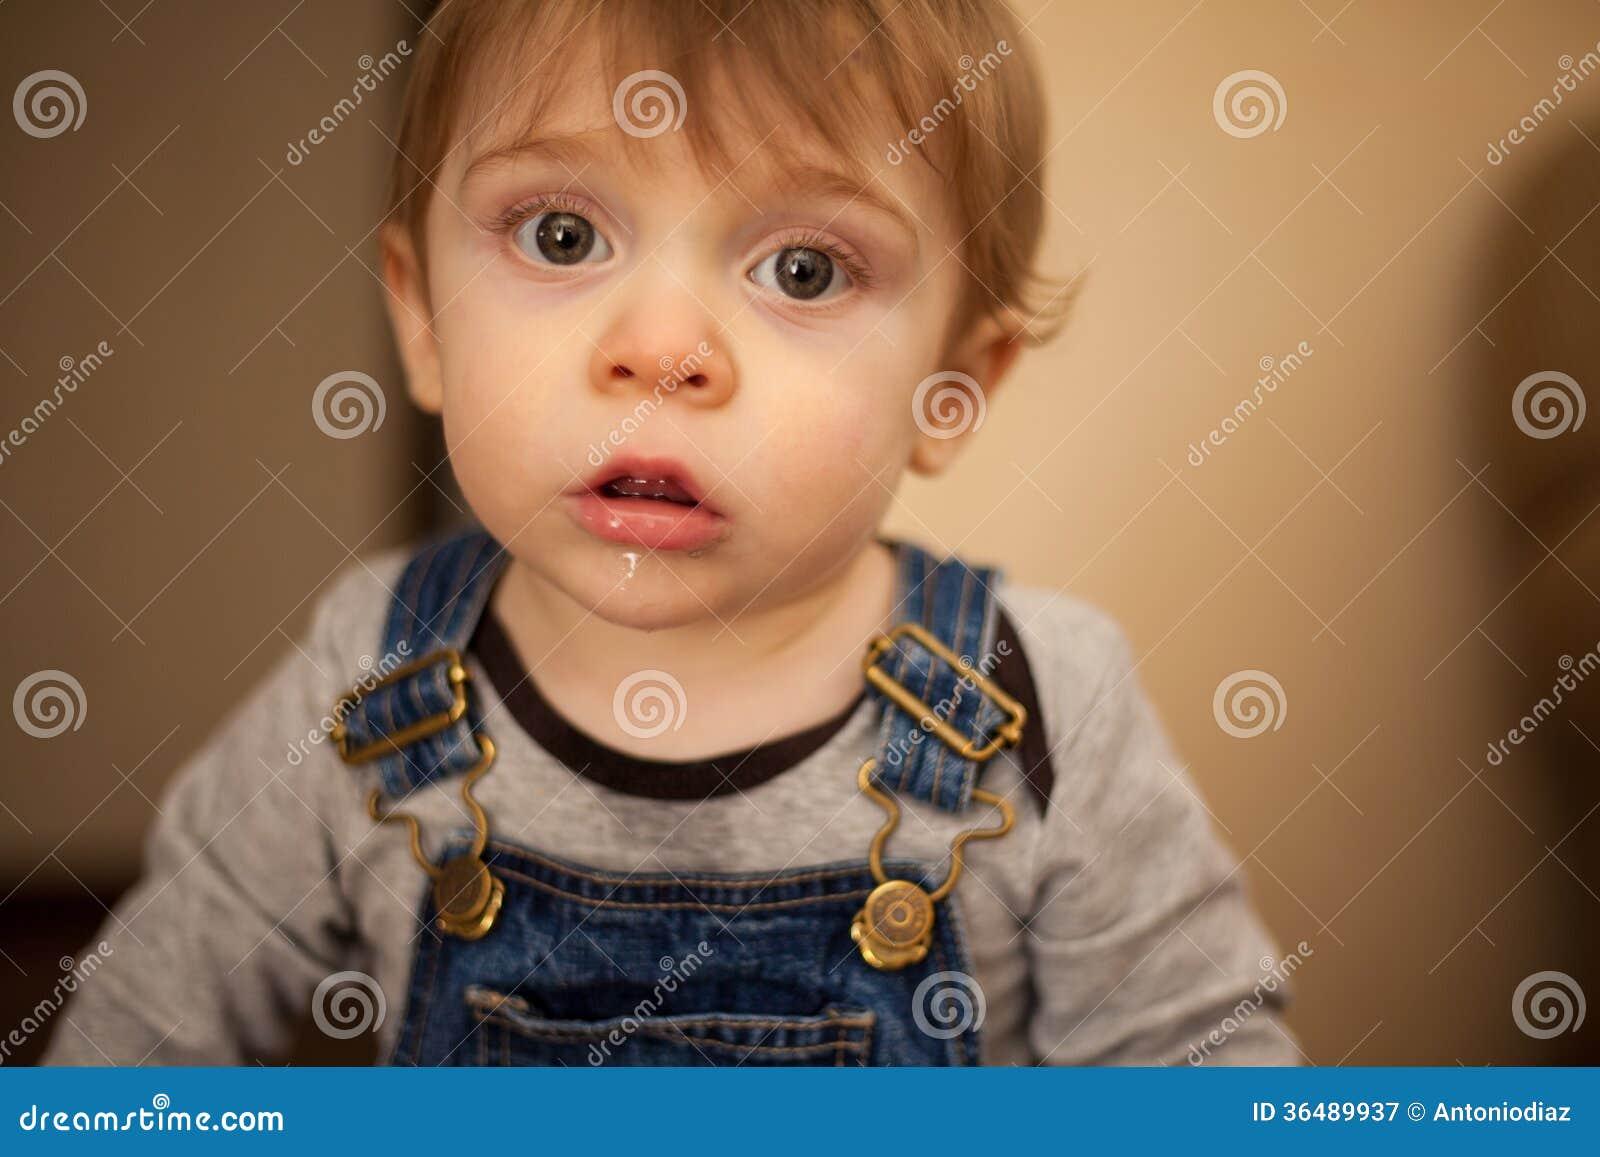 funny little kids - photo #11